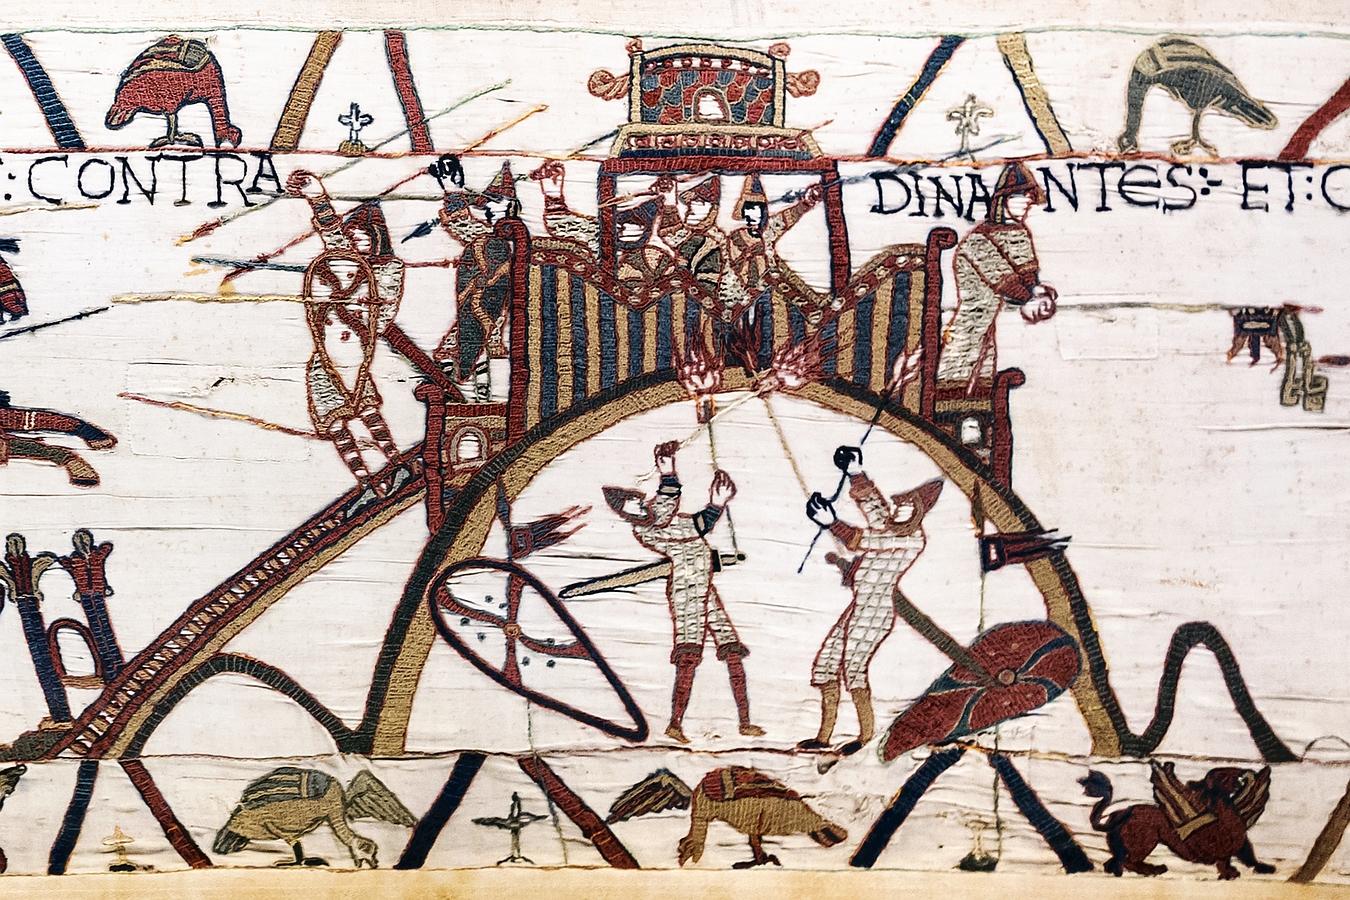 Motte Burg Mittelalter Wiki Fandom Powered By Wikia